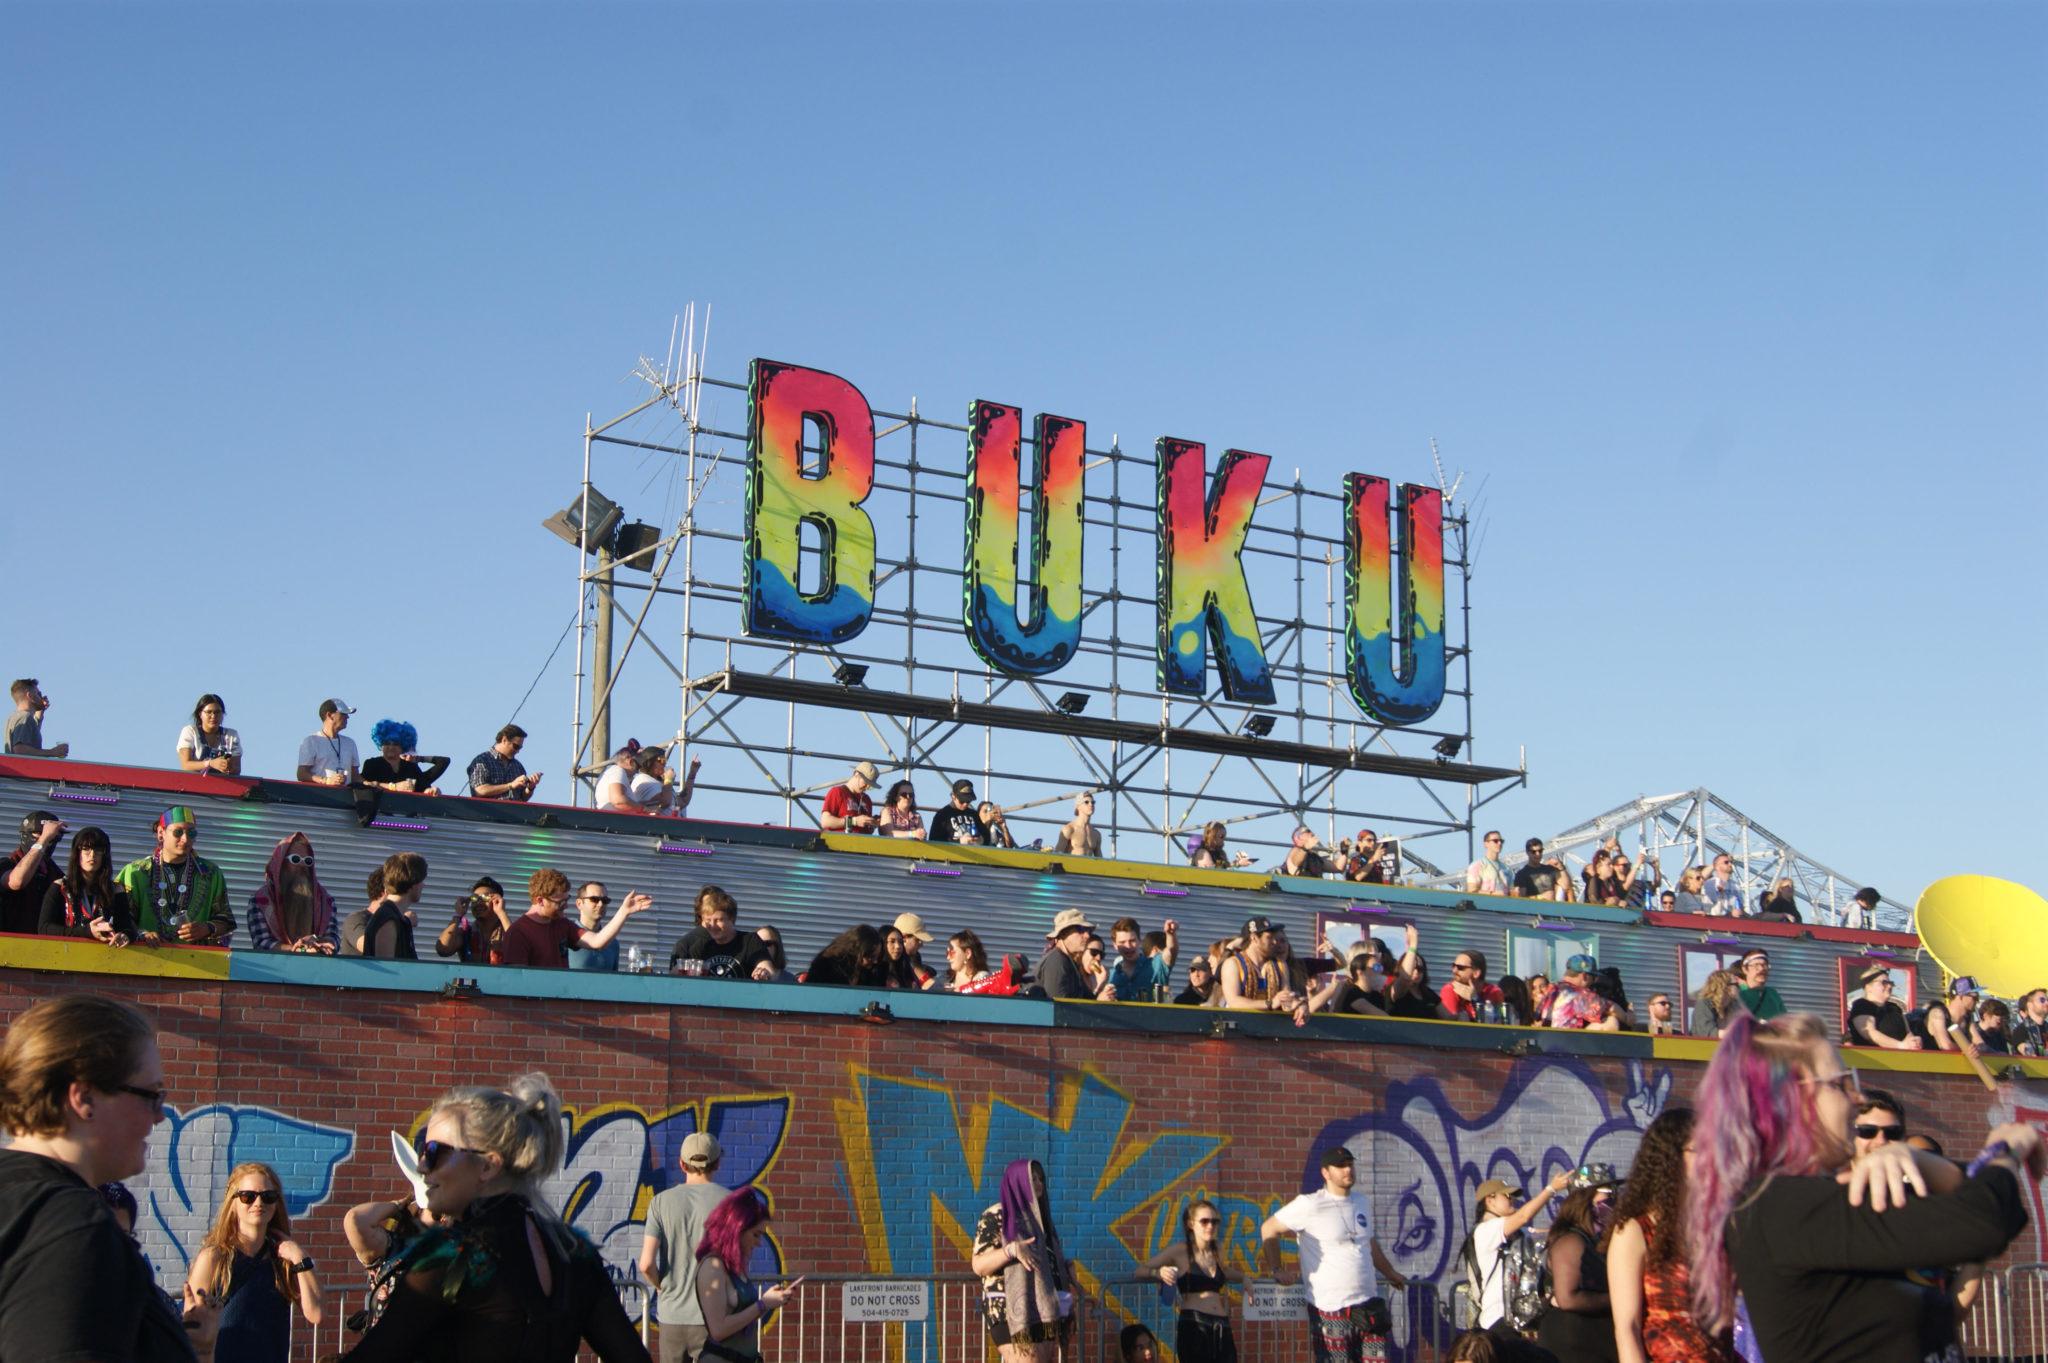 BUKU Festival Recap: Day 2